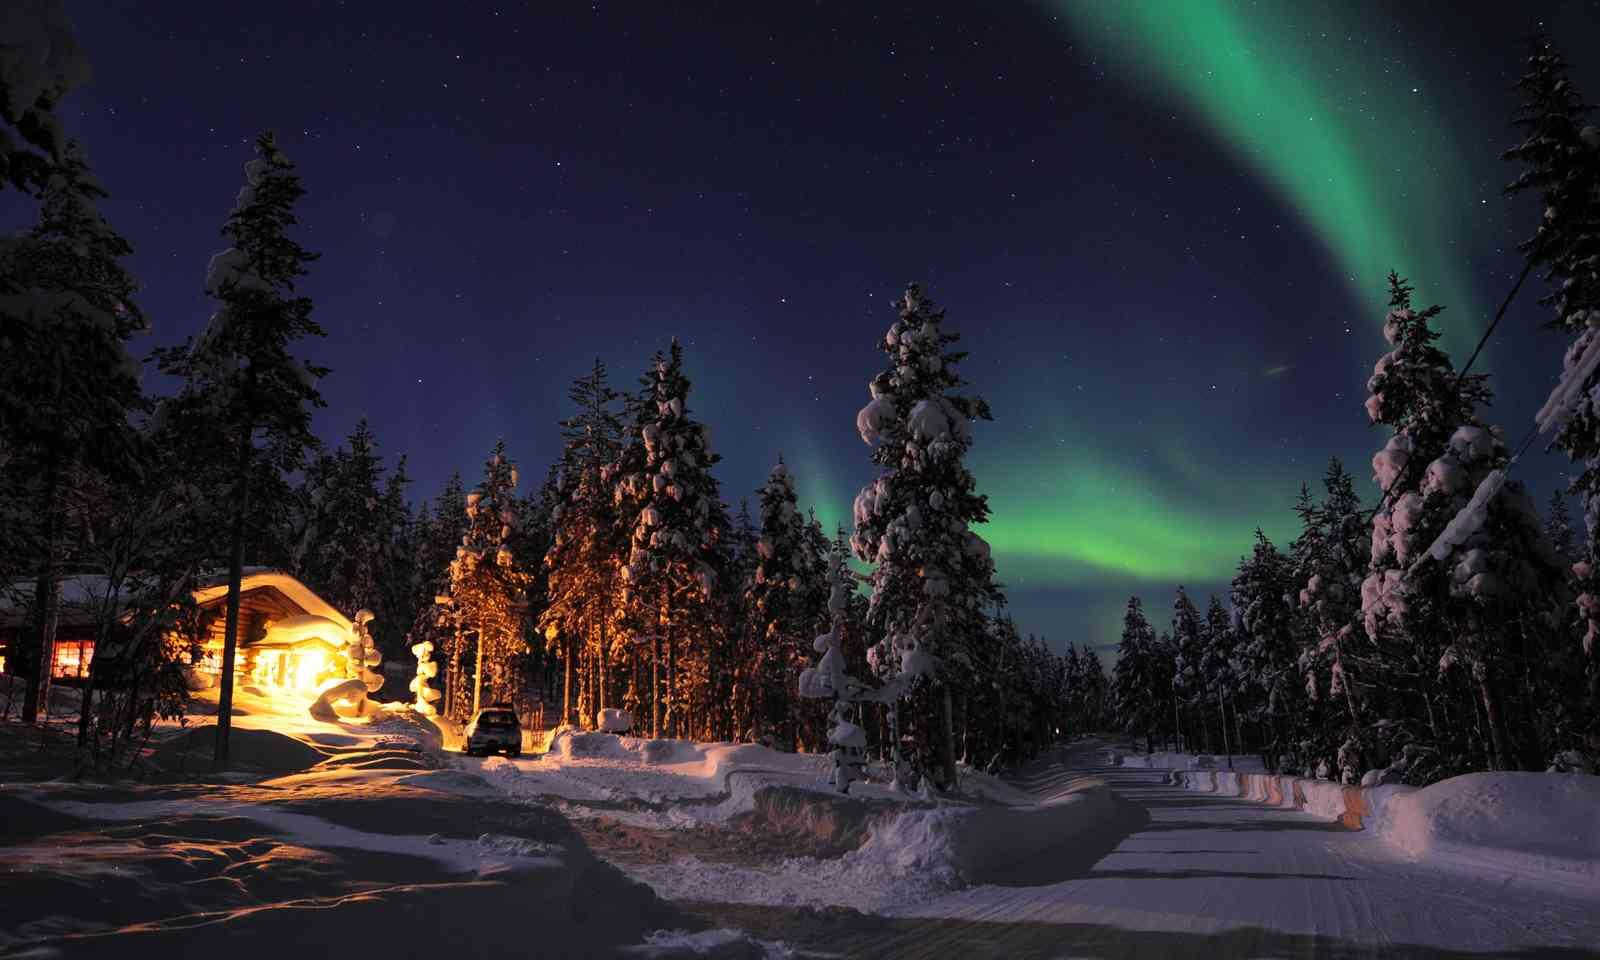 Northern Lights in Finland (Shutterstock.com)